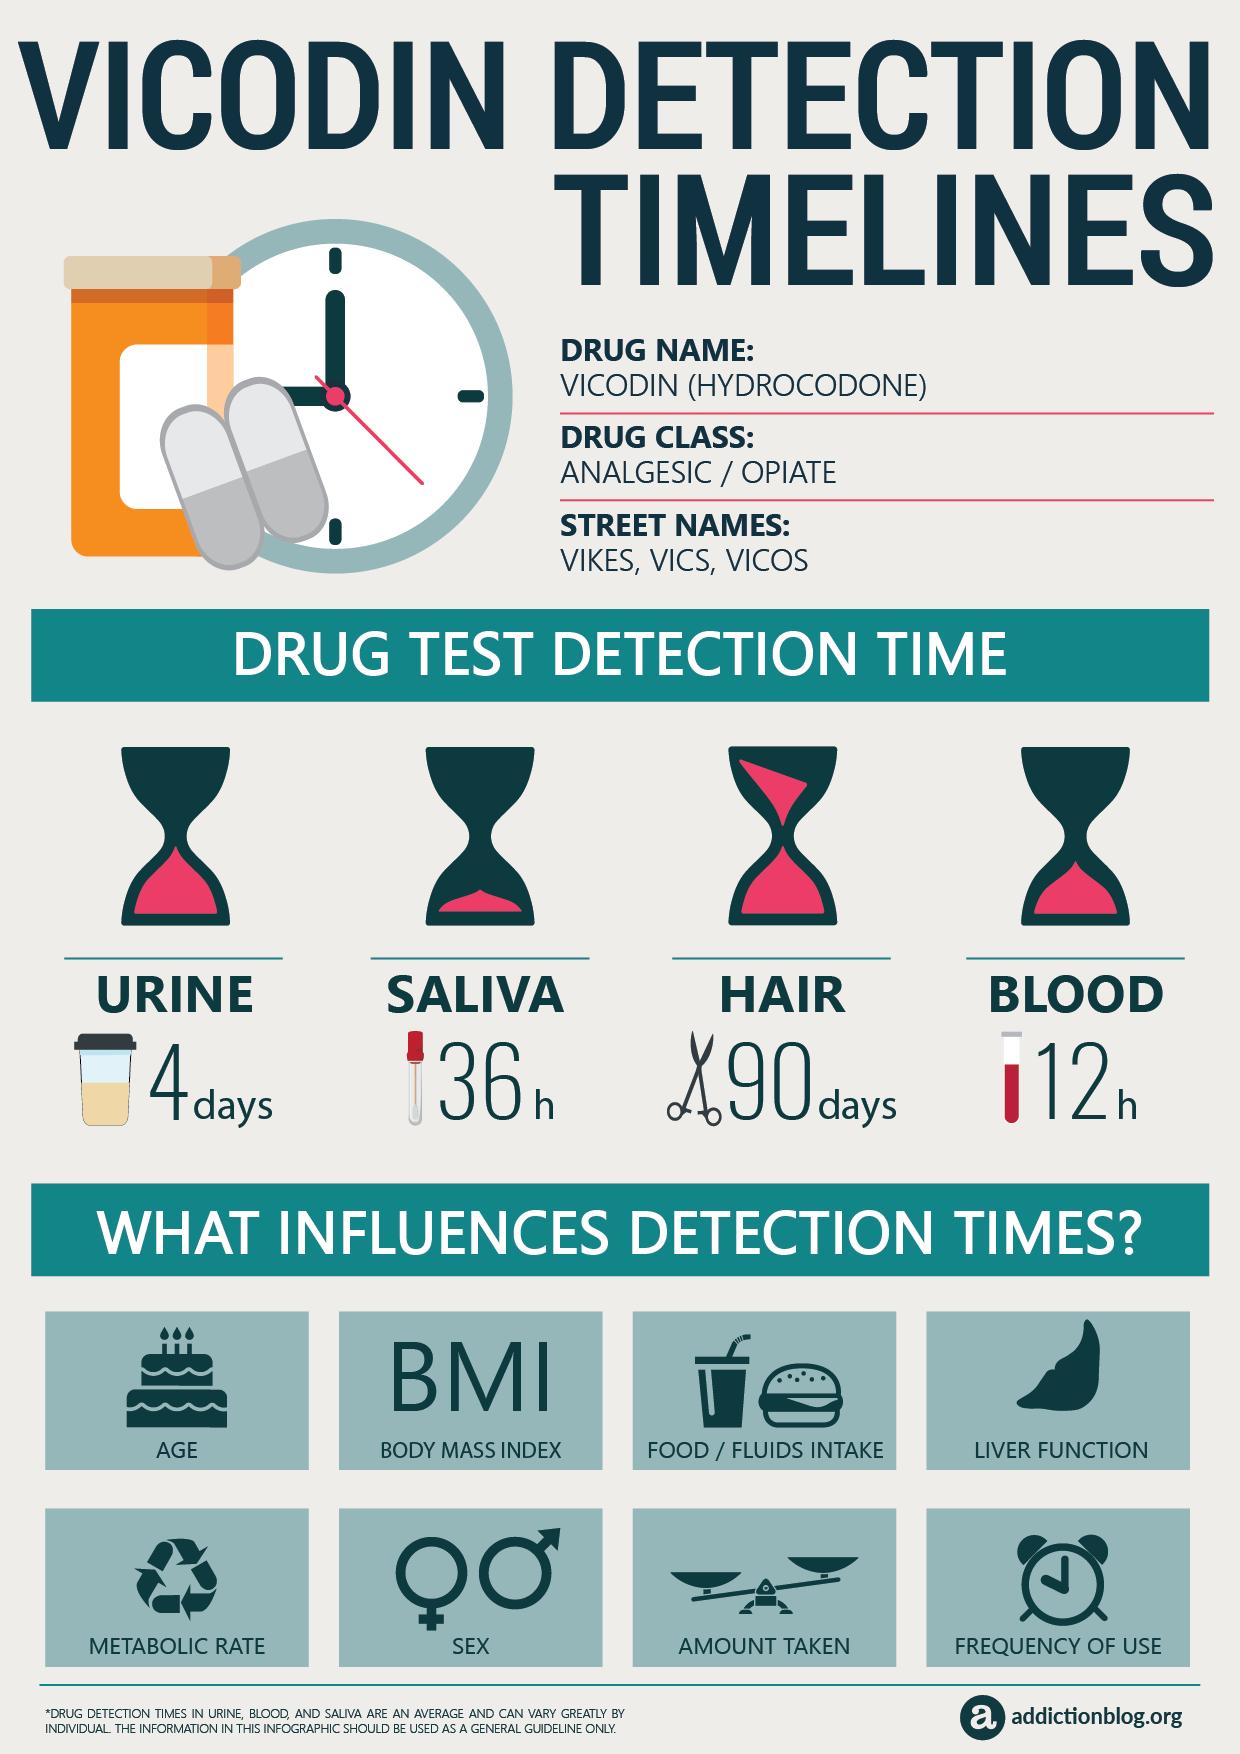 Vicodin Detection Timeline [INFOGRAPHIC]